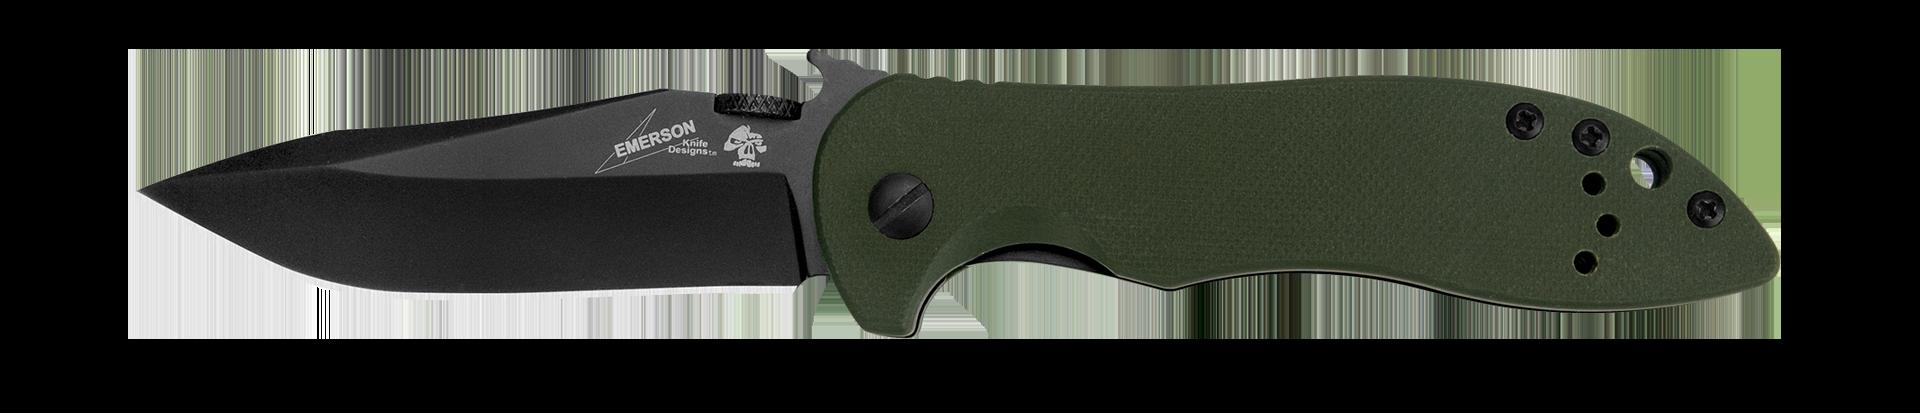 Kershaw Emerson Olive Drab G-10 CQC-5K Liner Lock Stainless Pocket Knife